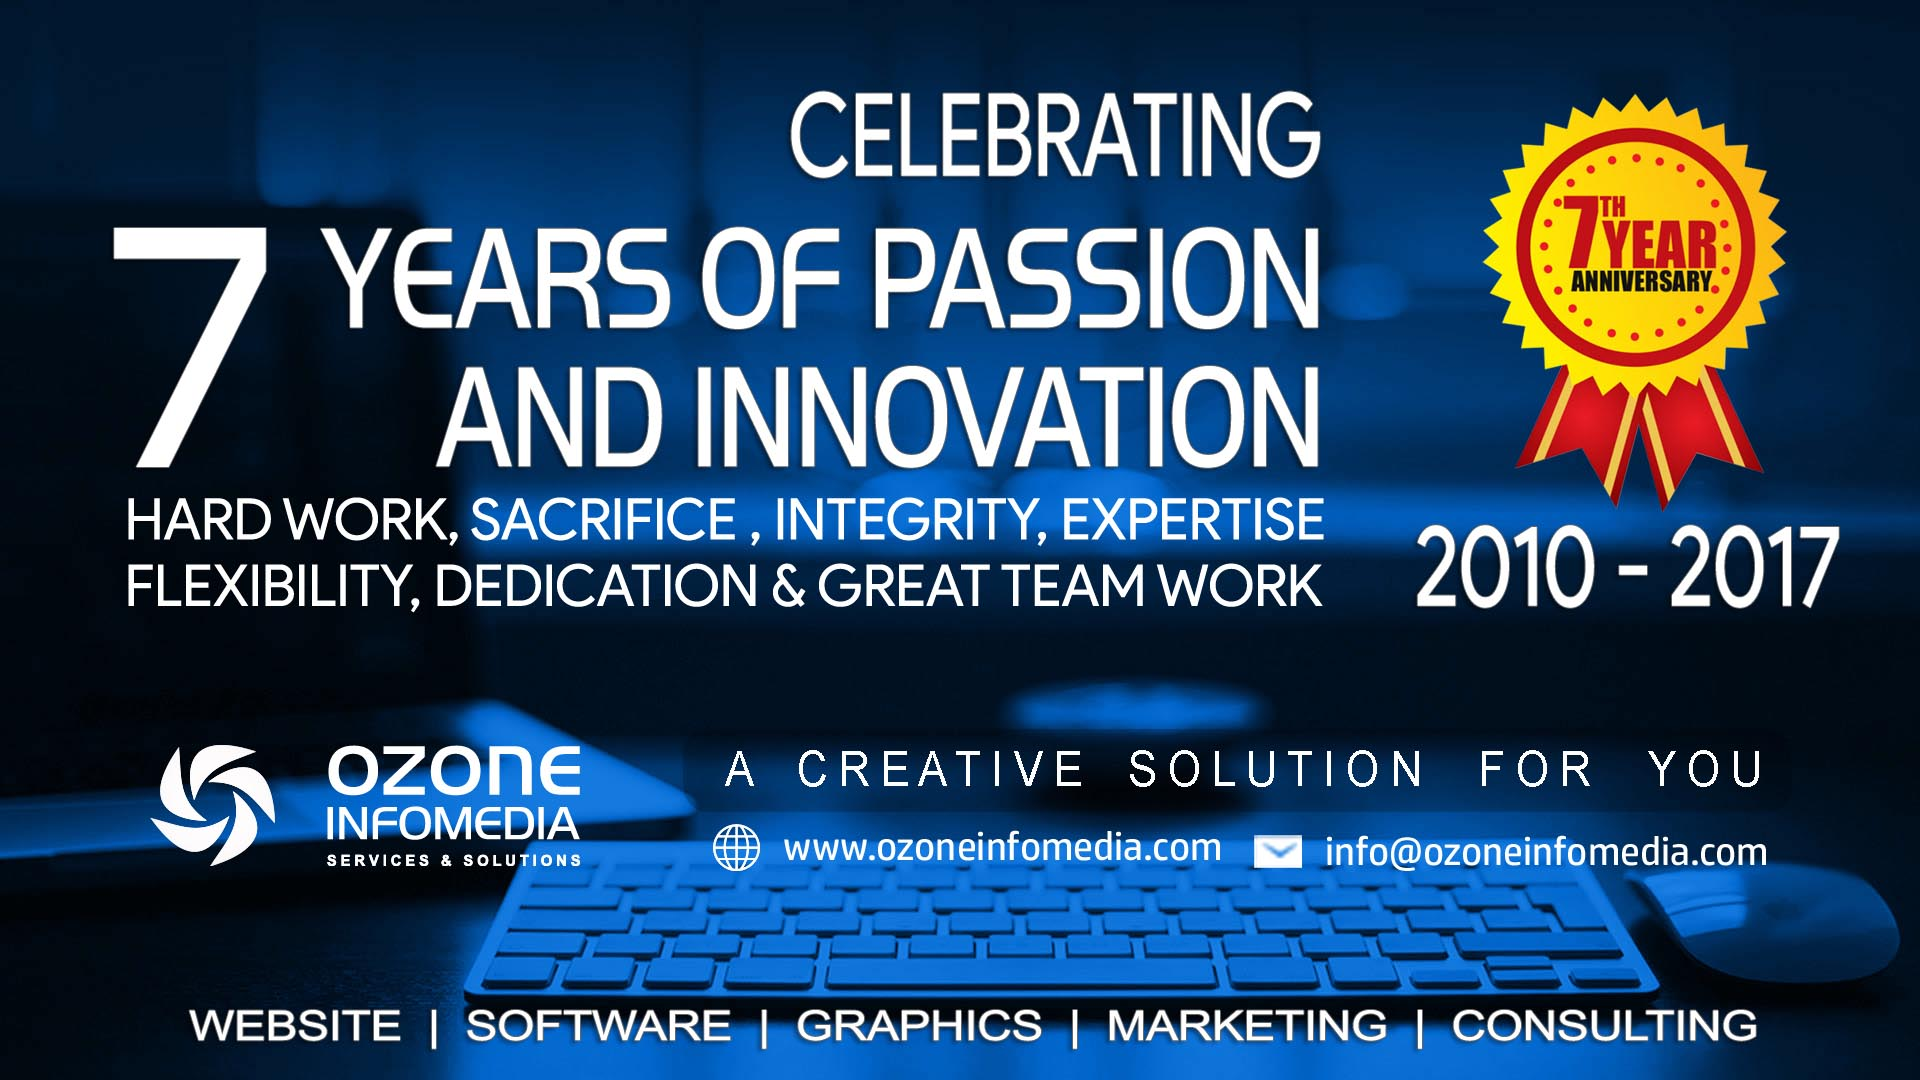 Ozone Infomedia Services & Solutions Celebrates 7th Anniversary | The Bihar News